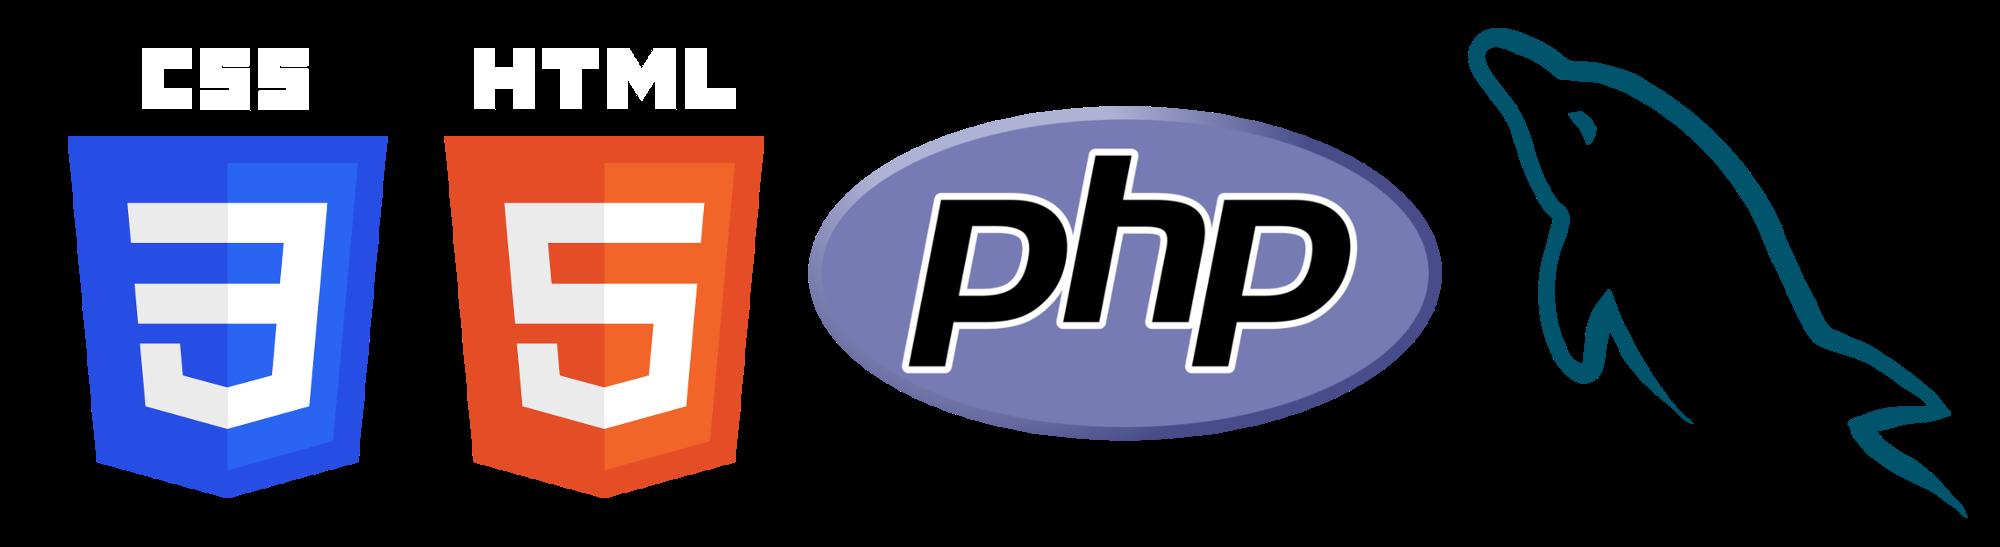 Html php mysql logo. Facebook clipart css